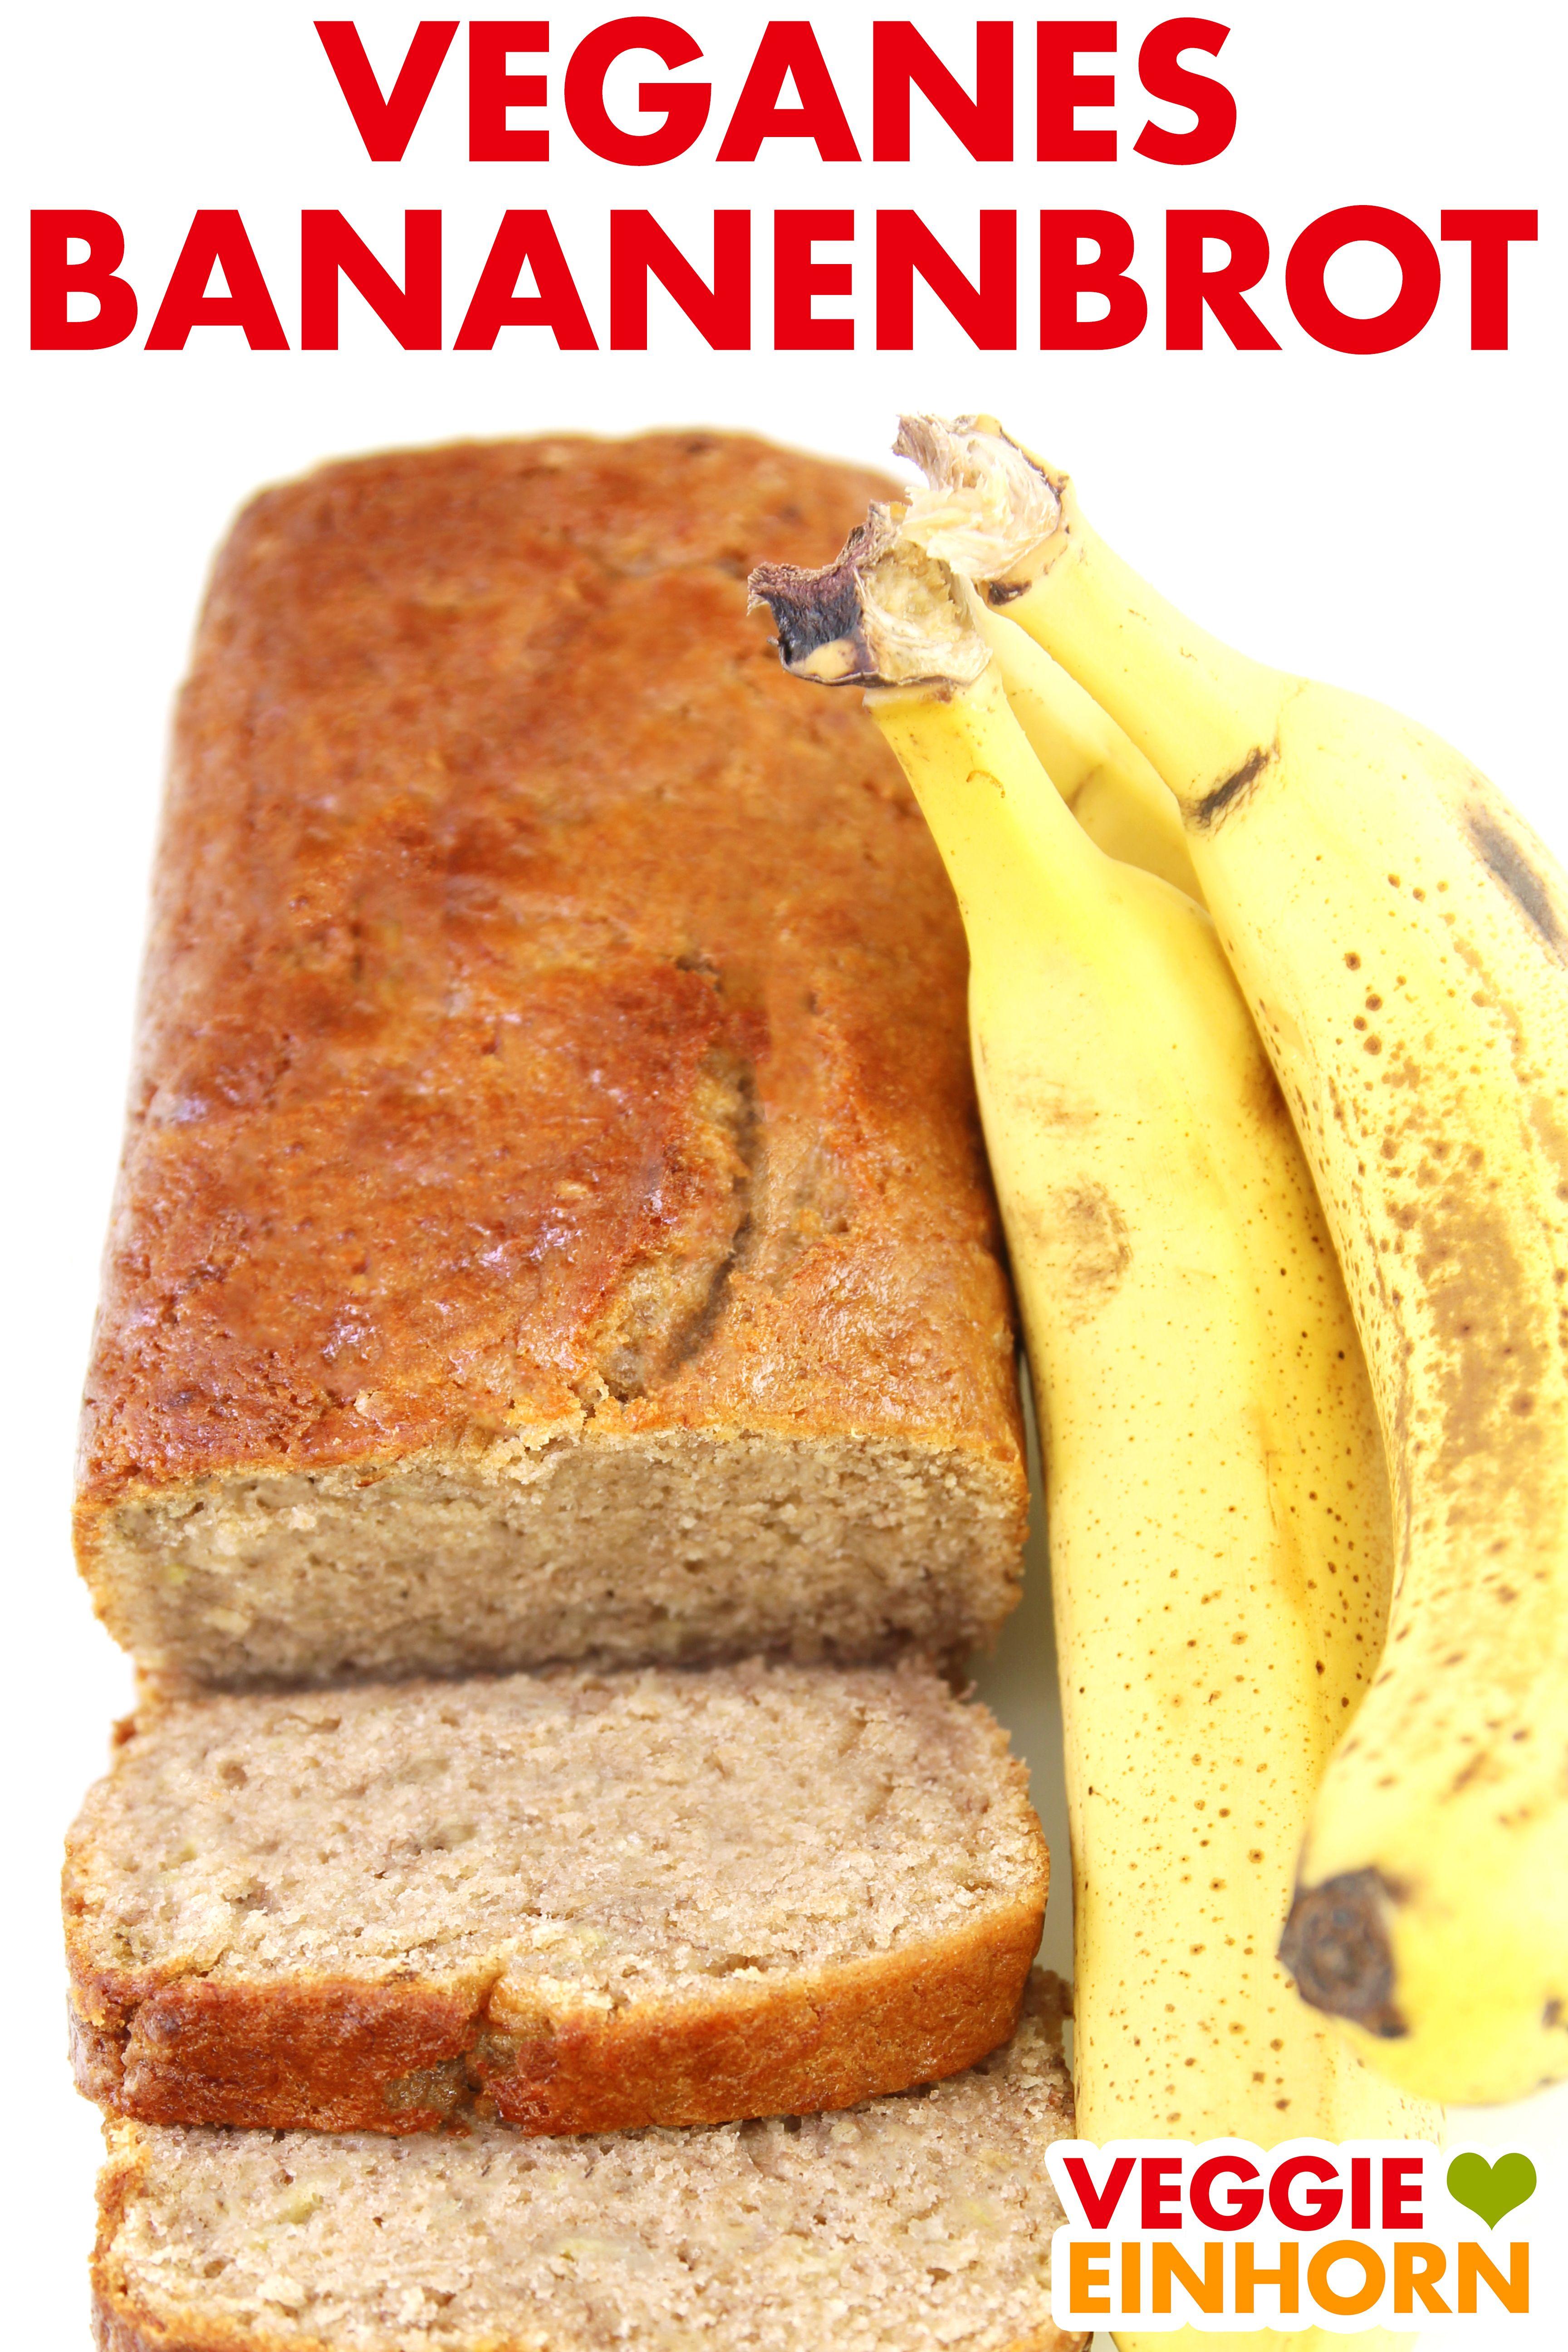 Saftiges Veganes Bananenbrot Einfach Rezept Bananenbrot Einfach Bananenbrot Saftig Und Bananenbrot